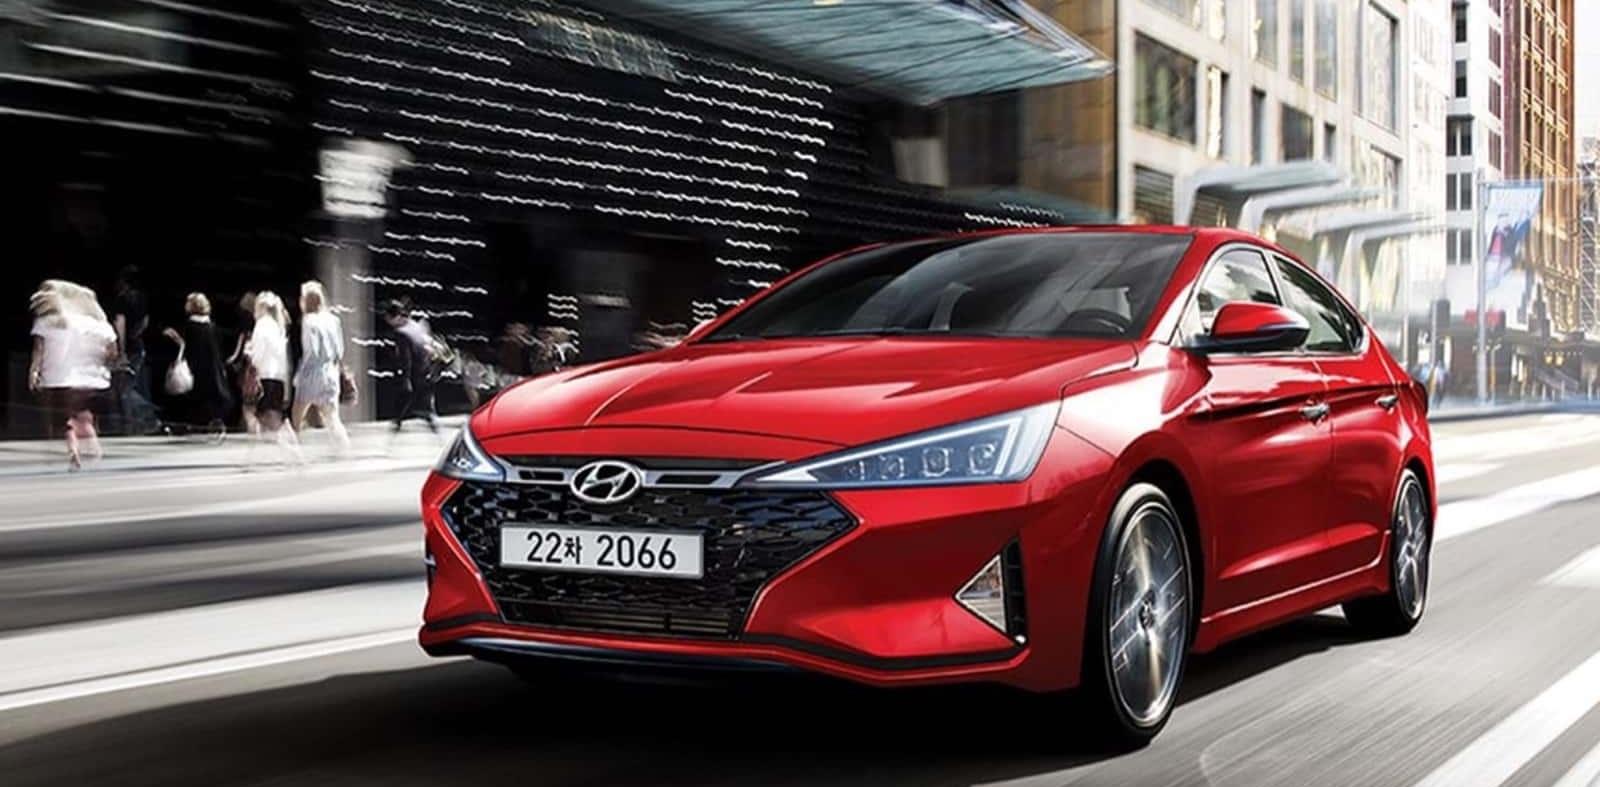 2019 Hyundai Elantra Sport revealed - early details out!